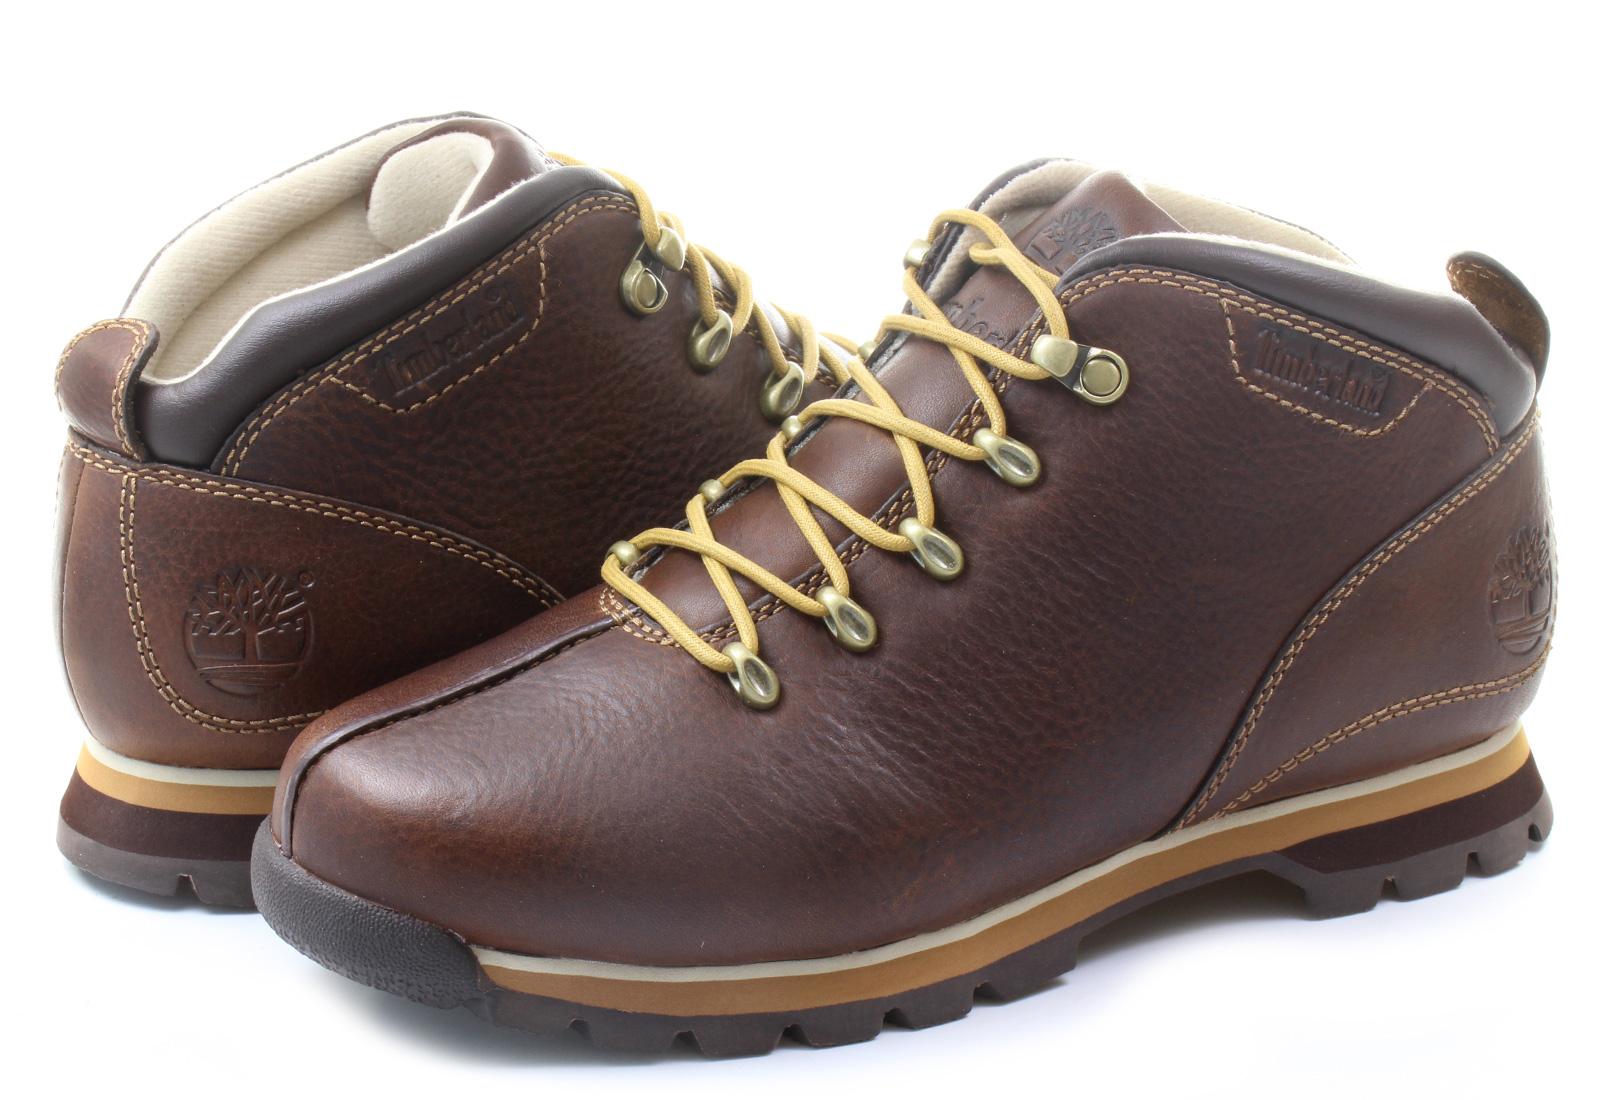 timberland boots splitrock hiker 41084 brn